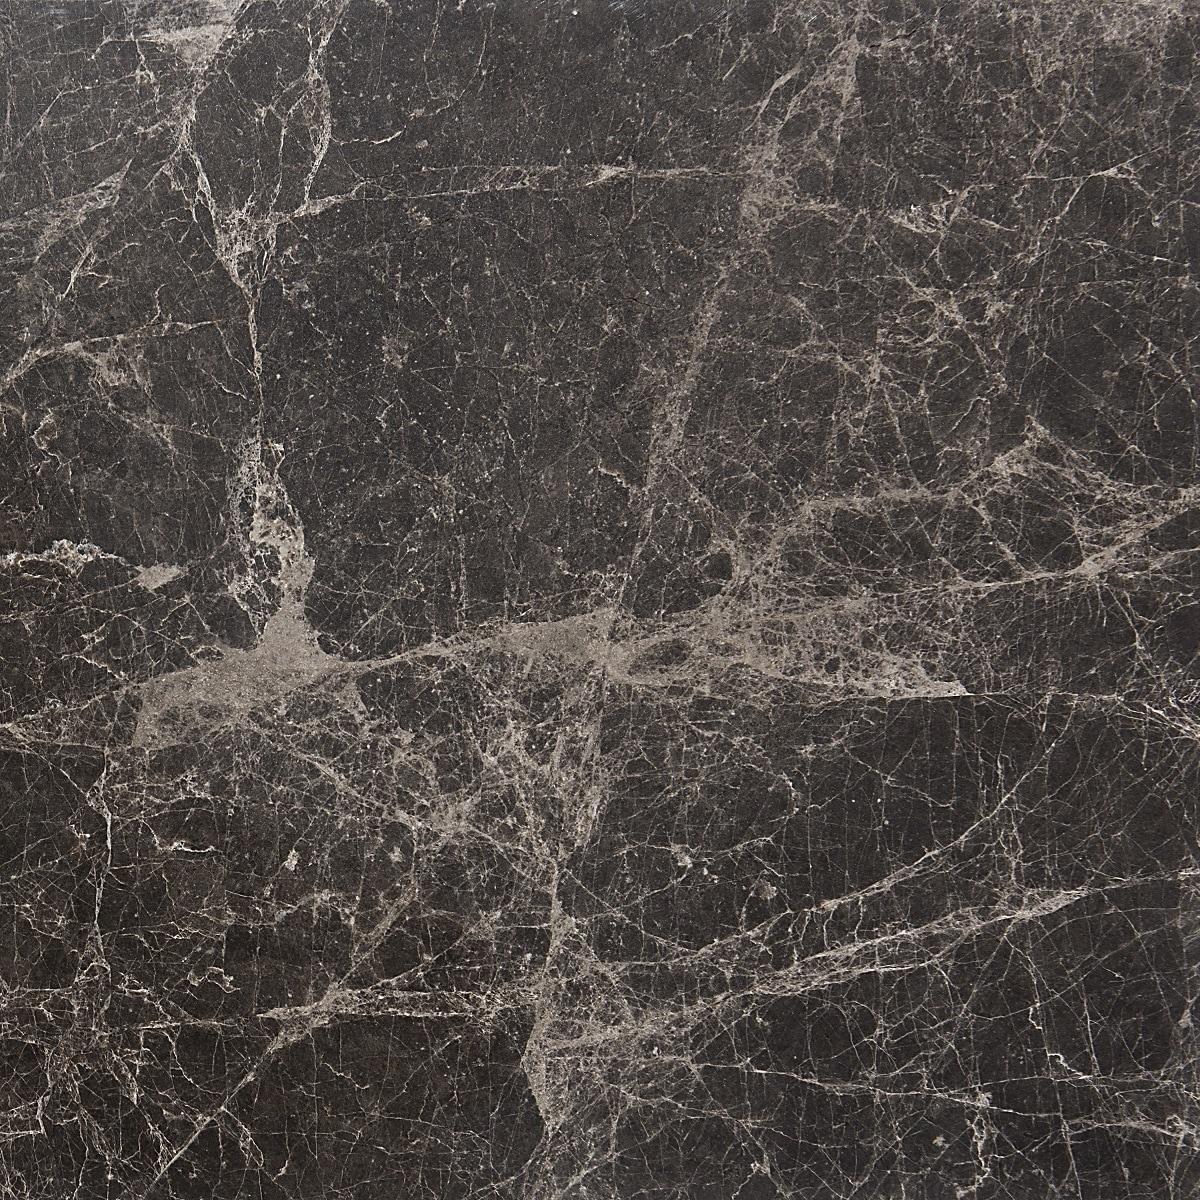 Marbletiledirect Emperador Dark Polished Bevelled Marble 12-inch x 24-inch x 1/2-inch Tiles (Case of 5 Tiles)